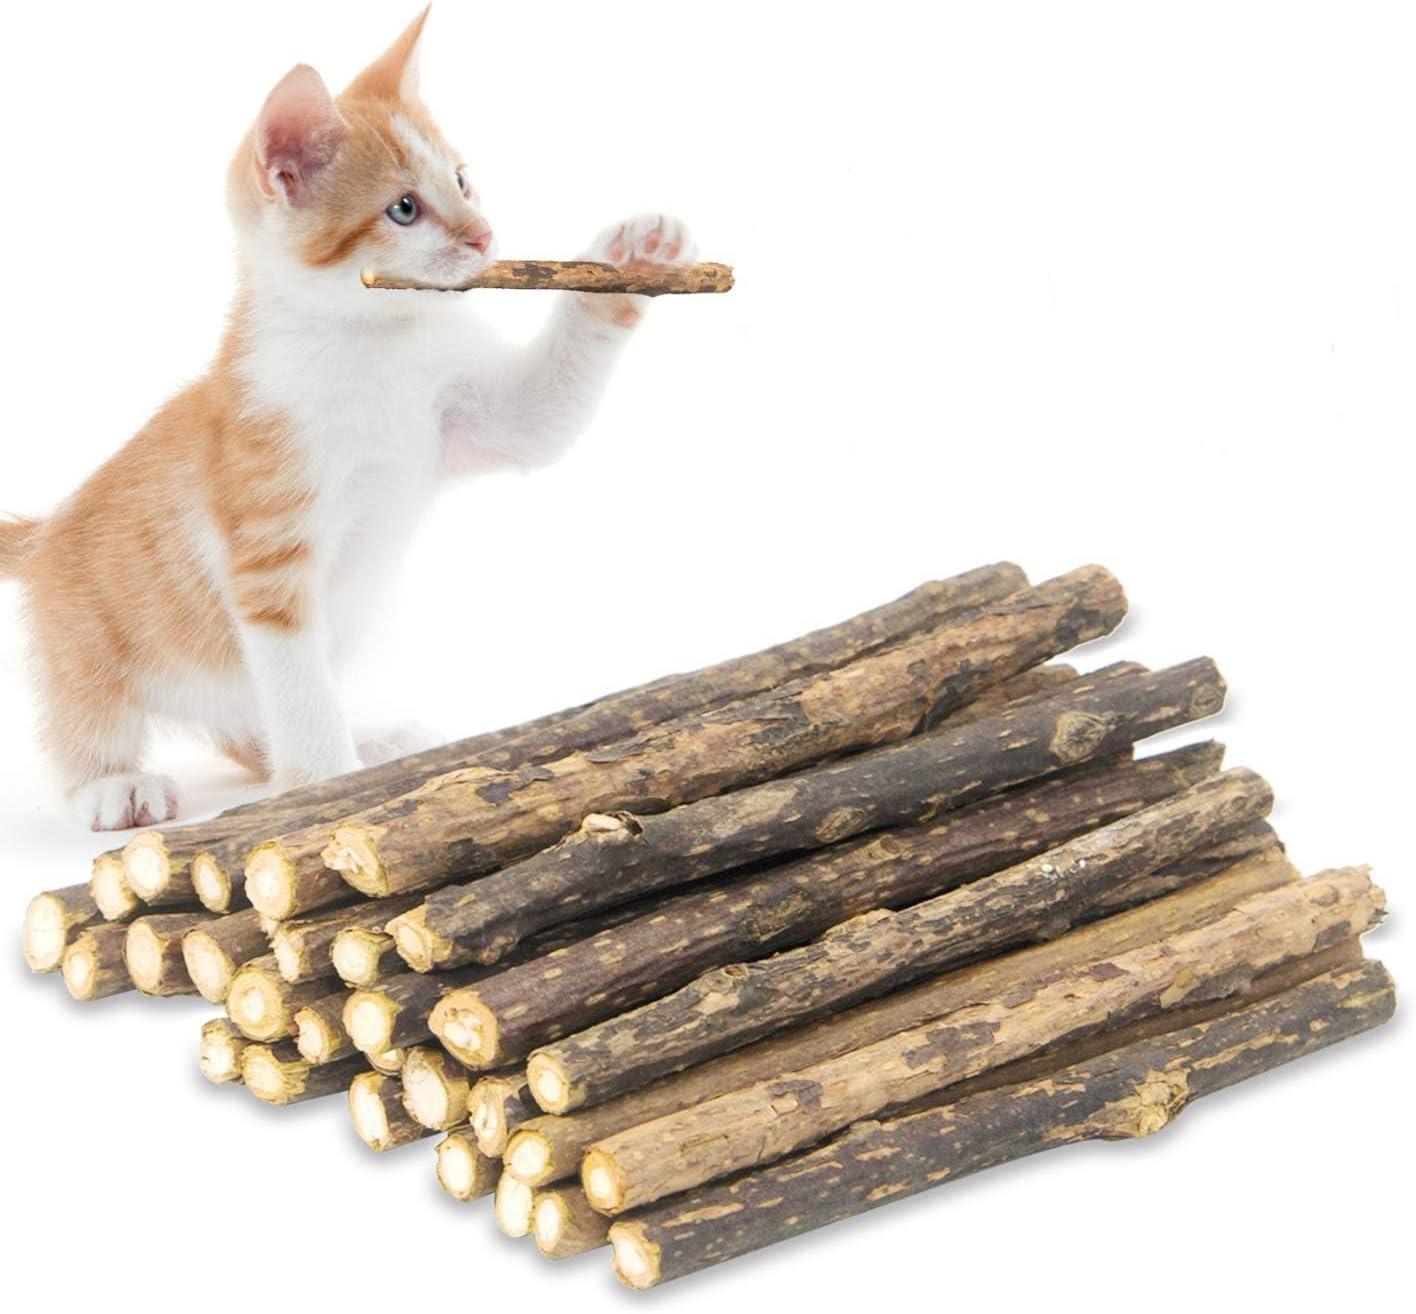 Super intense SALE 24 Pcs Catnip Sticks for Popular standard Cats Silvervine Natural Indoor